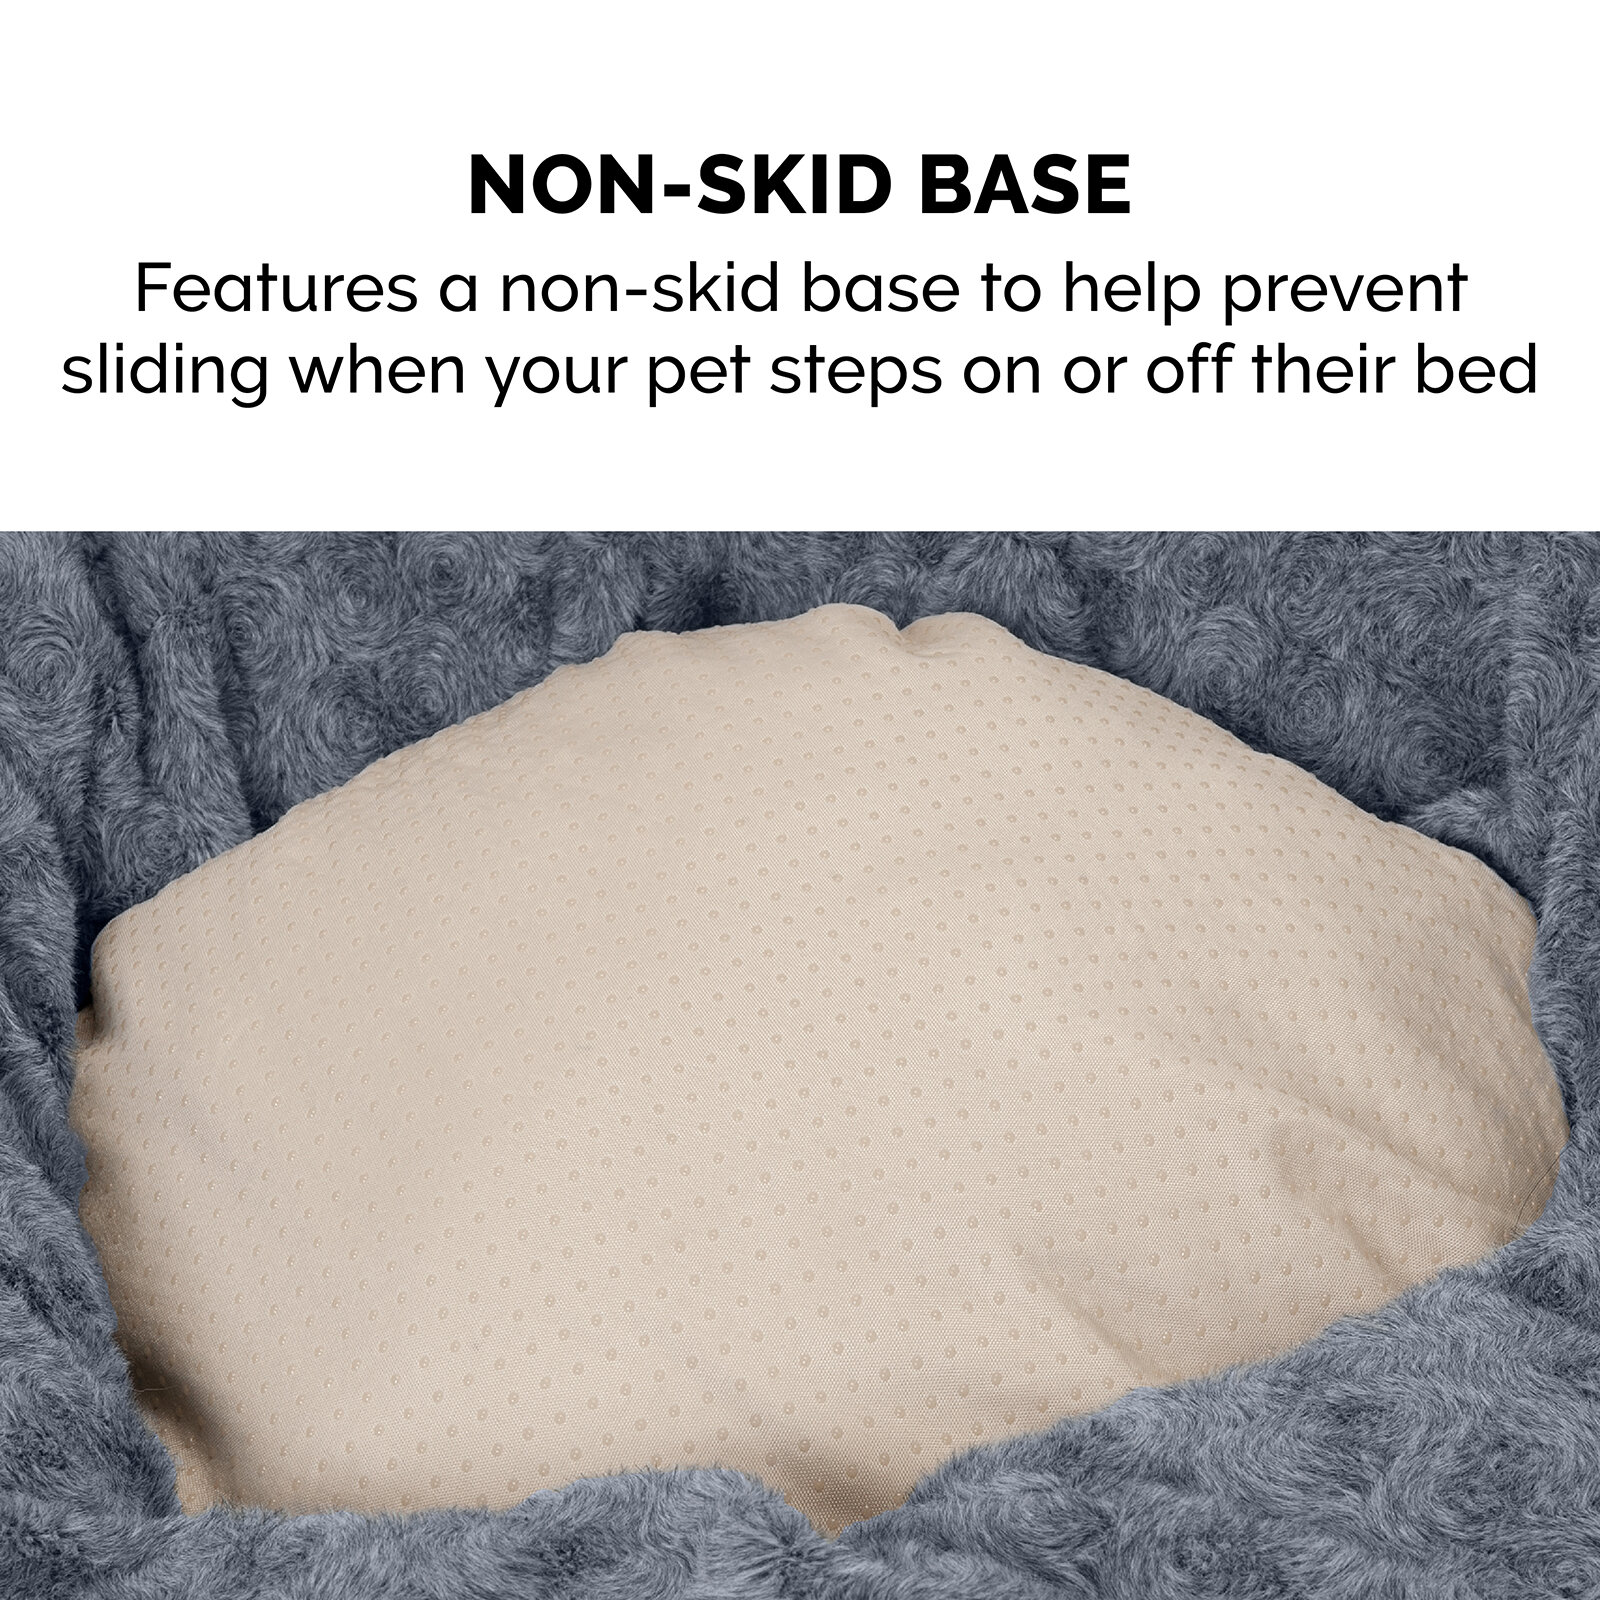 Non-Skid Base